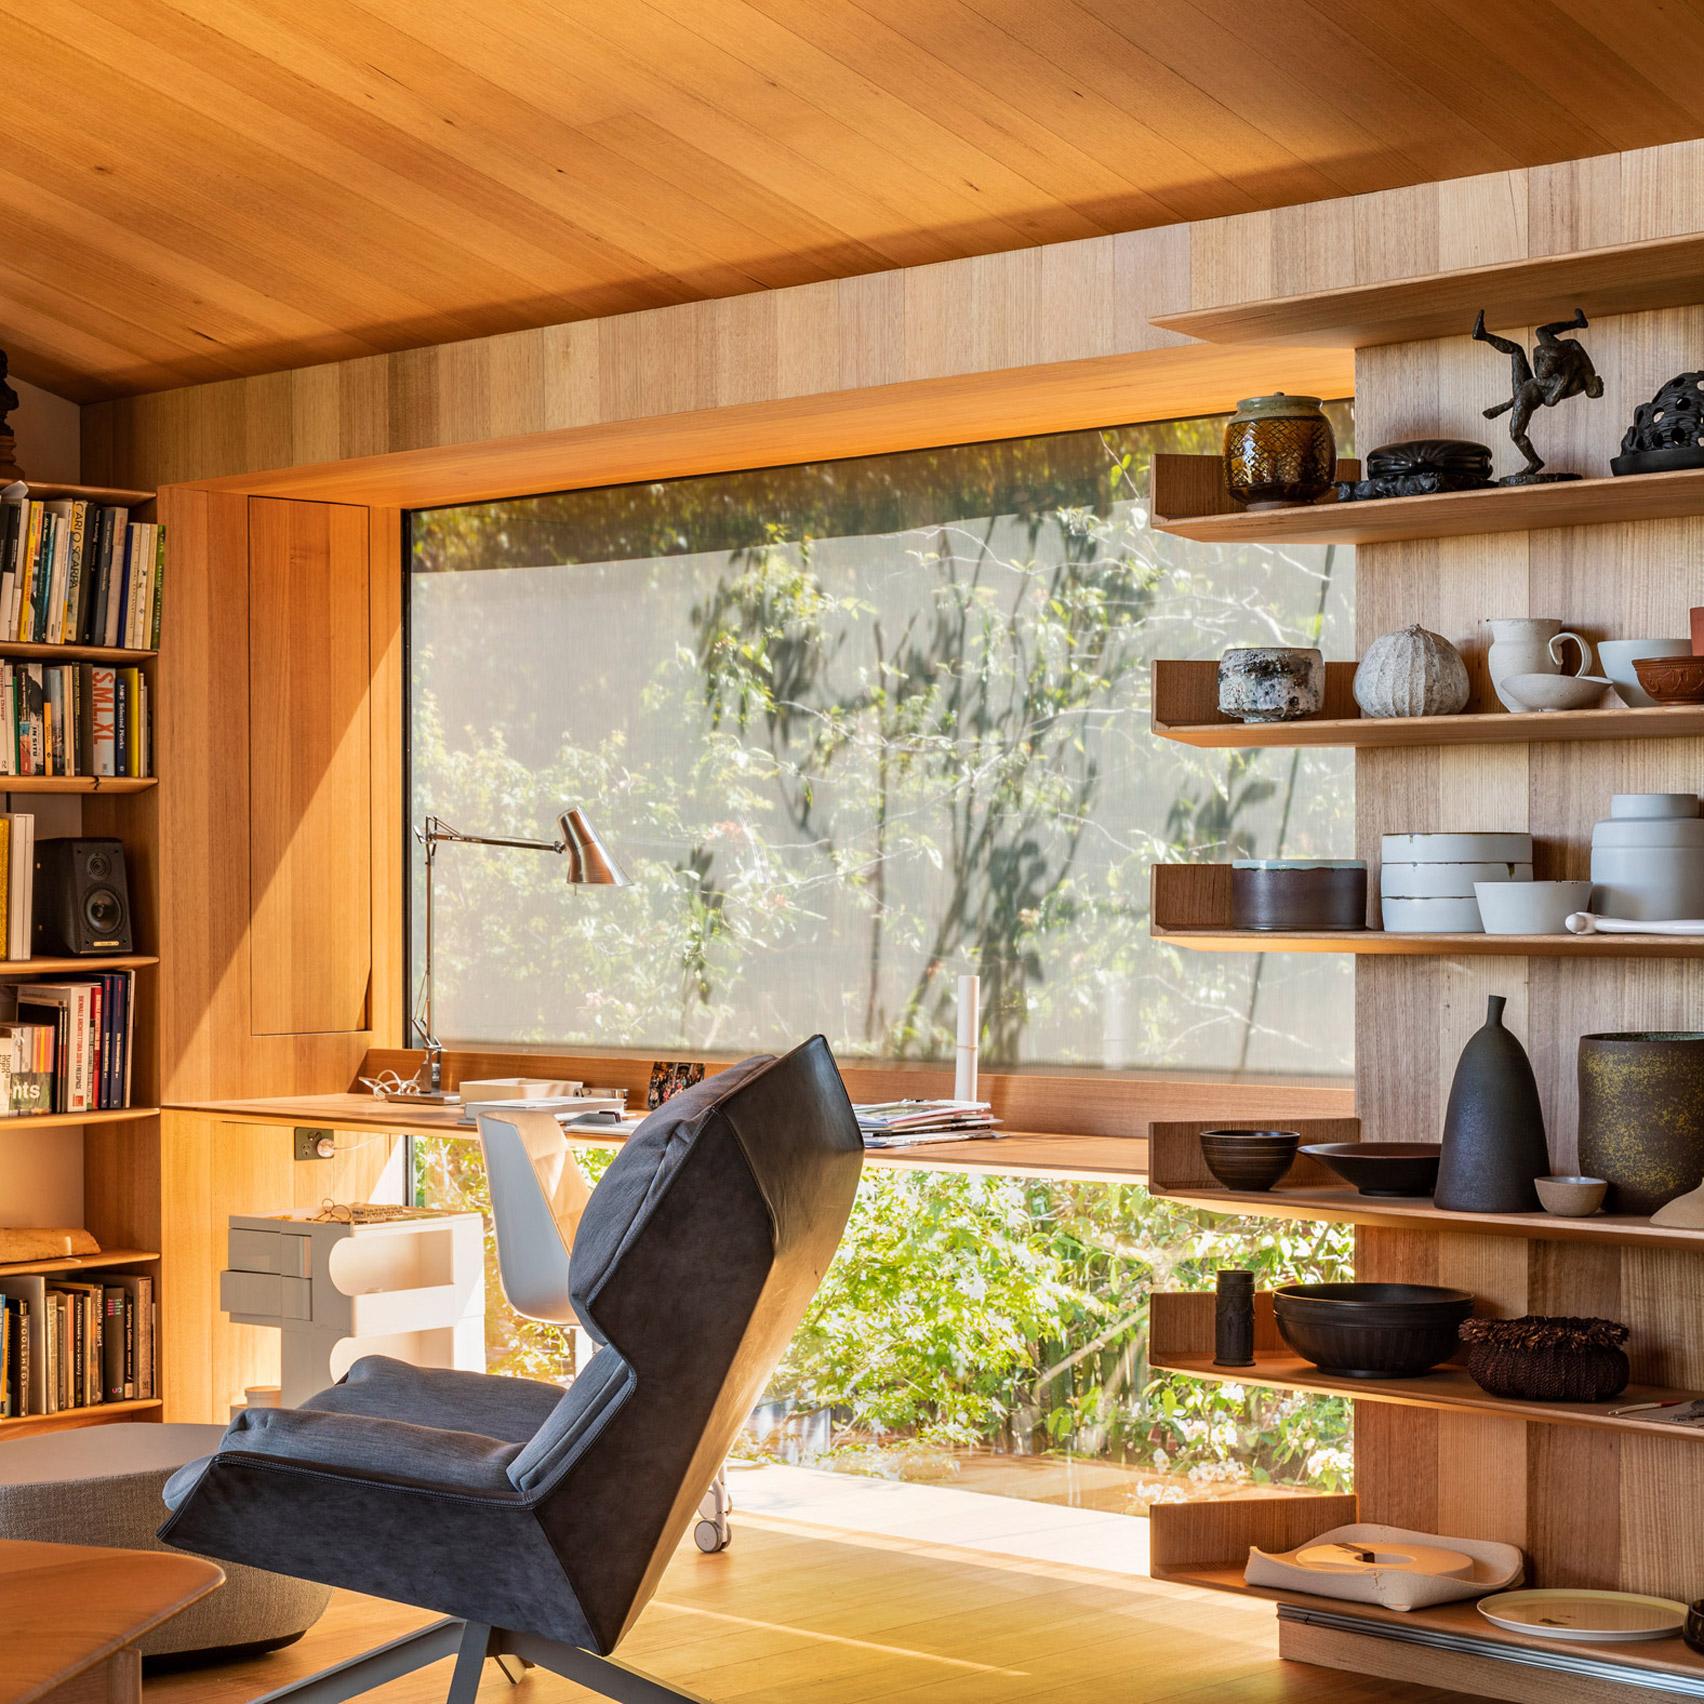 Dezeen's top home interiors of 2020: Kew Residence by John Wardle